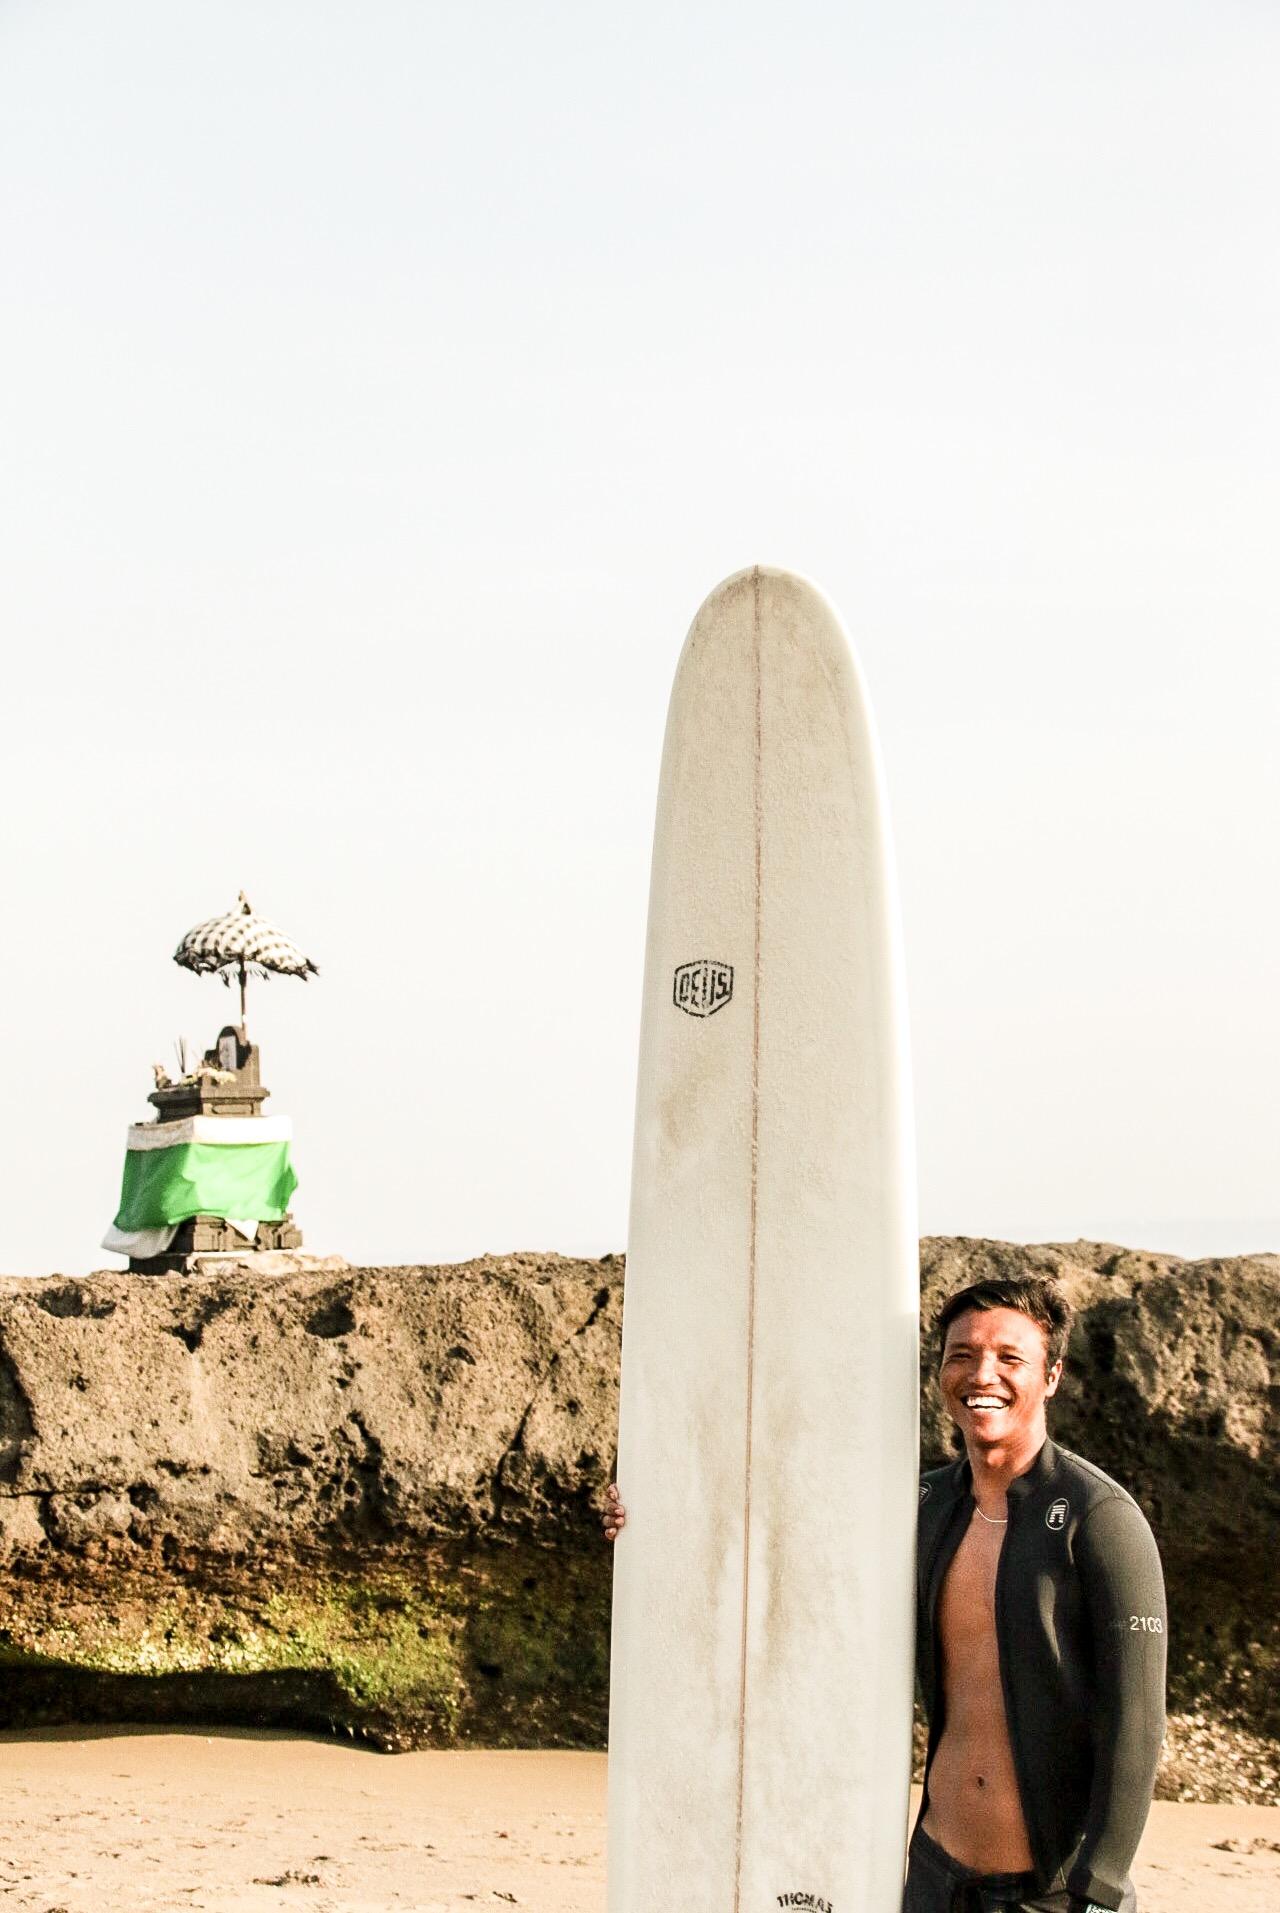 ayok canggu interview photo eight credit jemma scott mvmnt surf savage thrills